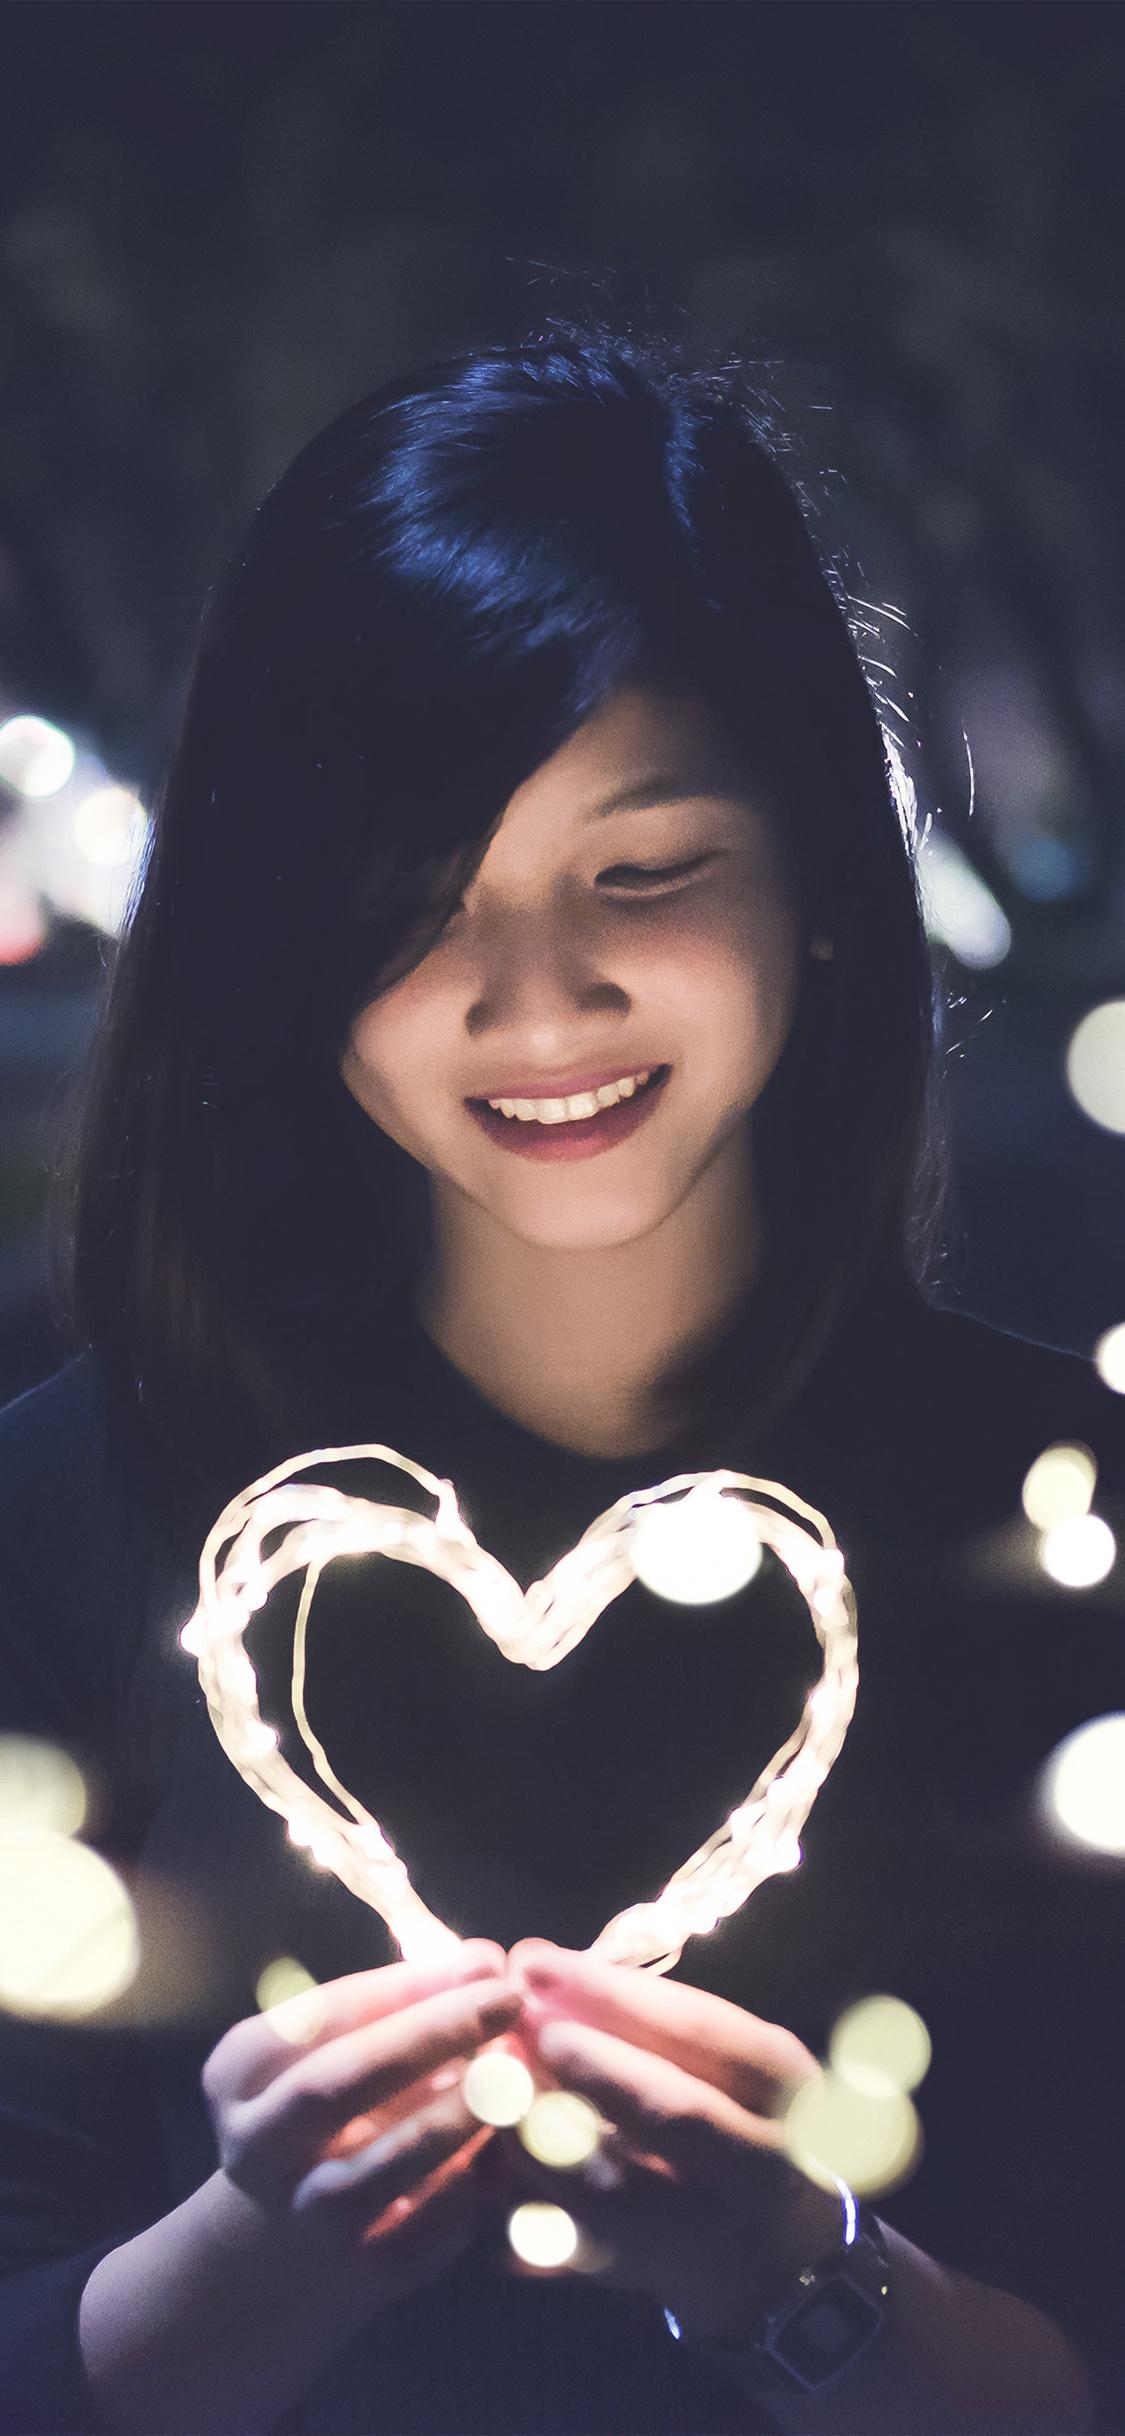 Love girl light dark night bokeh iPhone X wallpaper